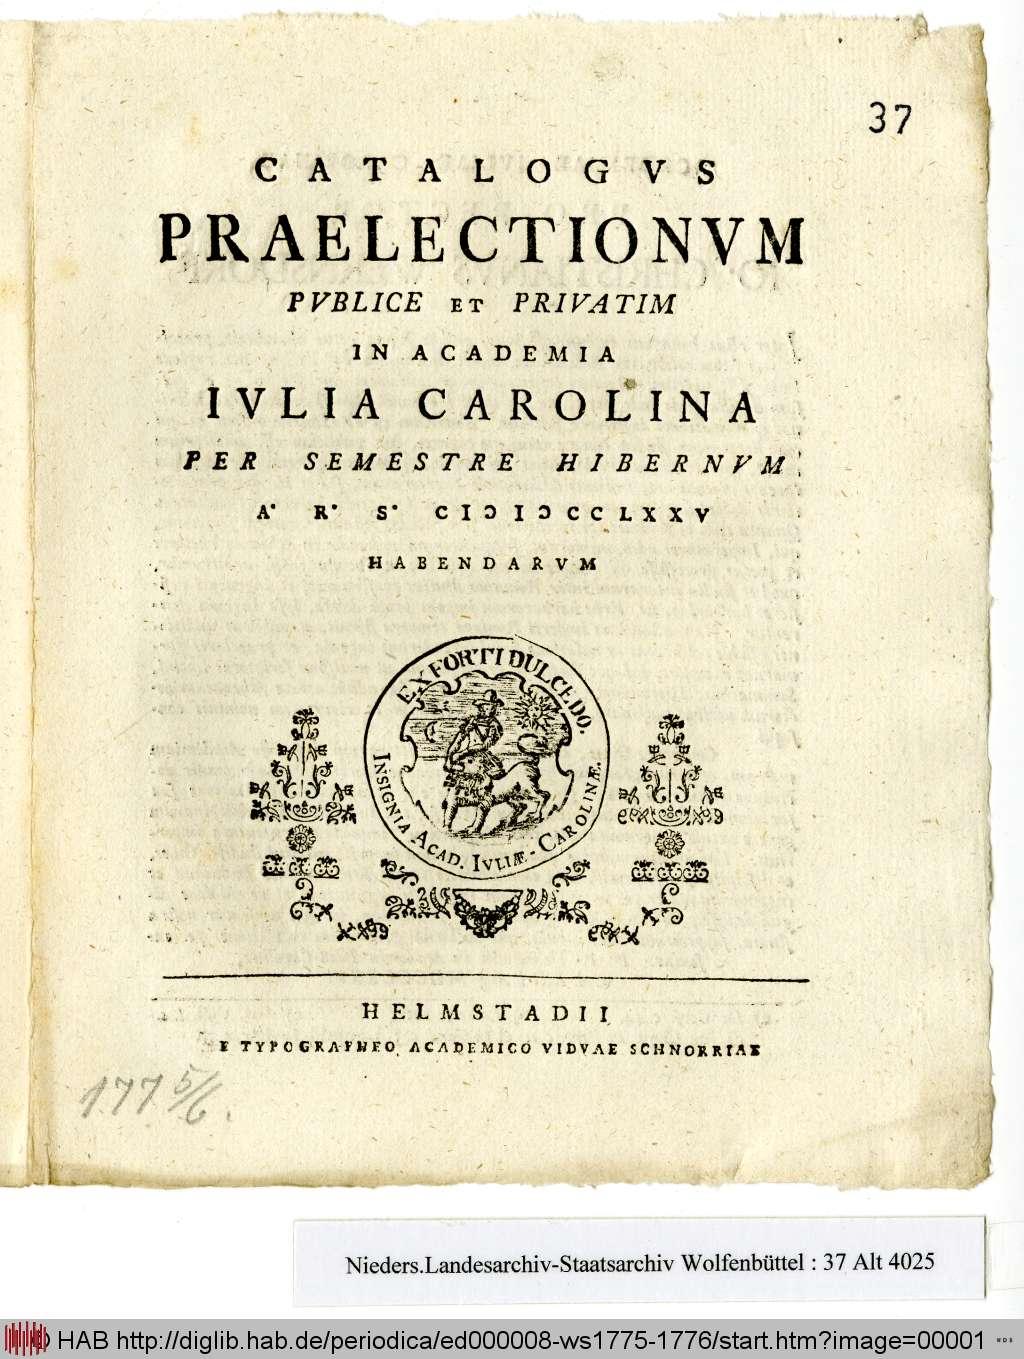 http://diglib.hab.de/periodica/ed000008-ws1775-1776/00001.jpg